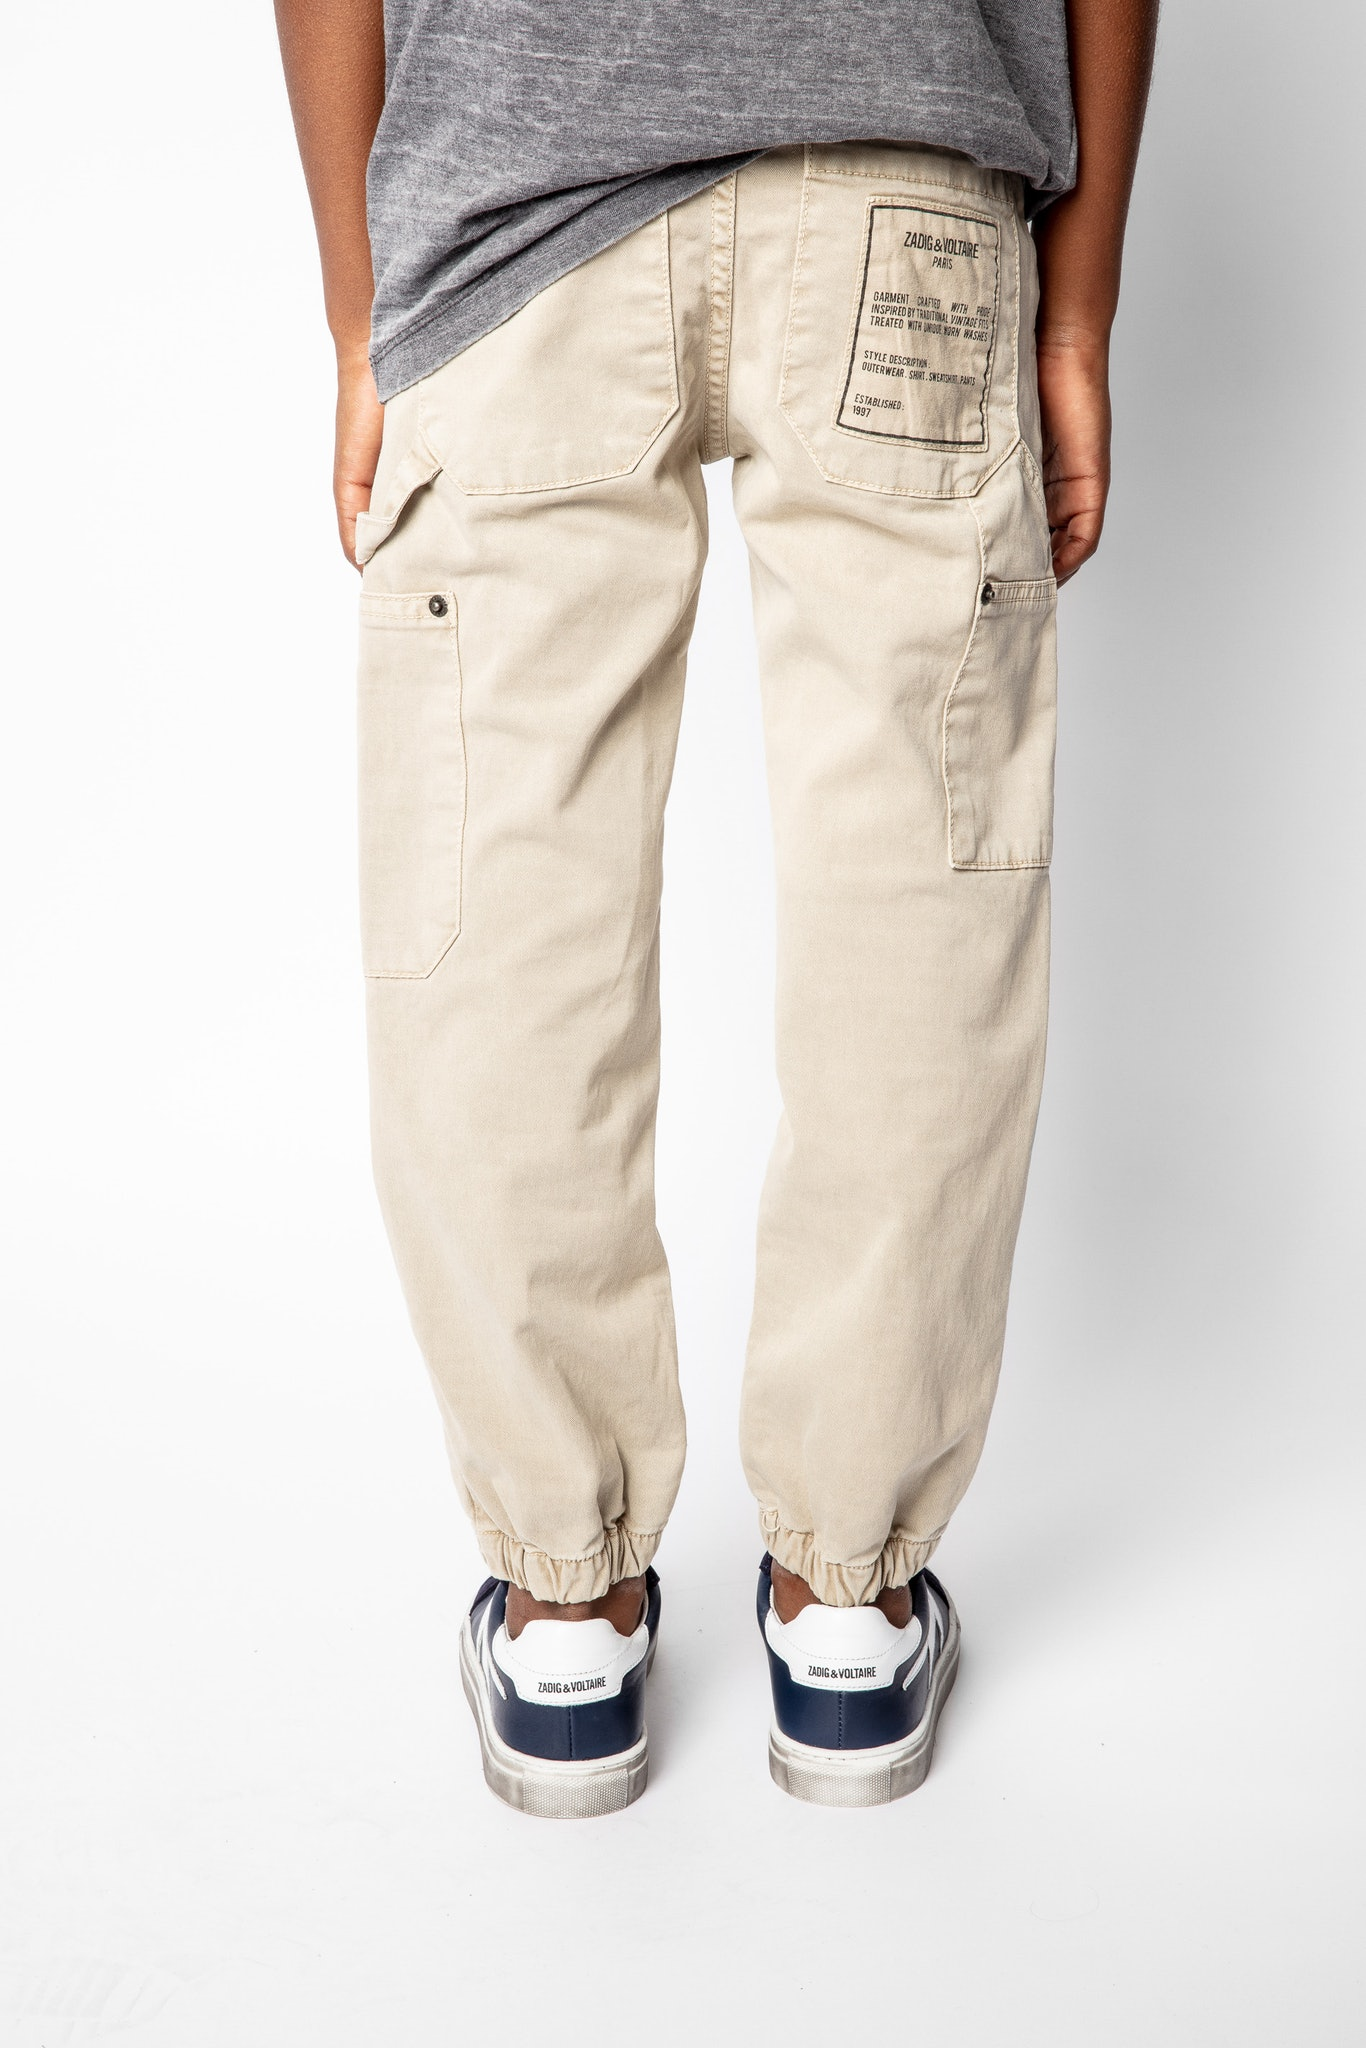 Pantalón Theo Infantil